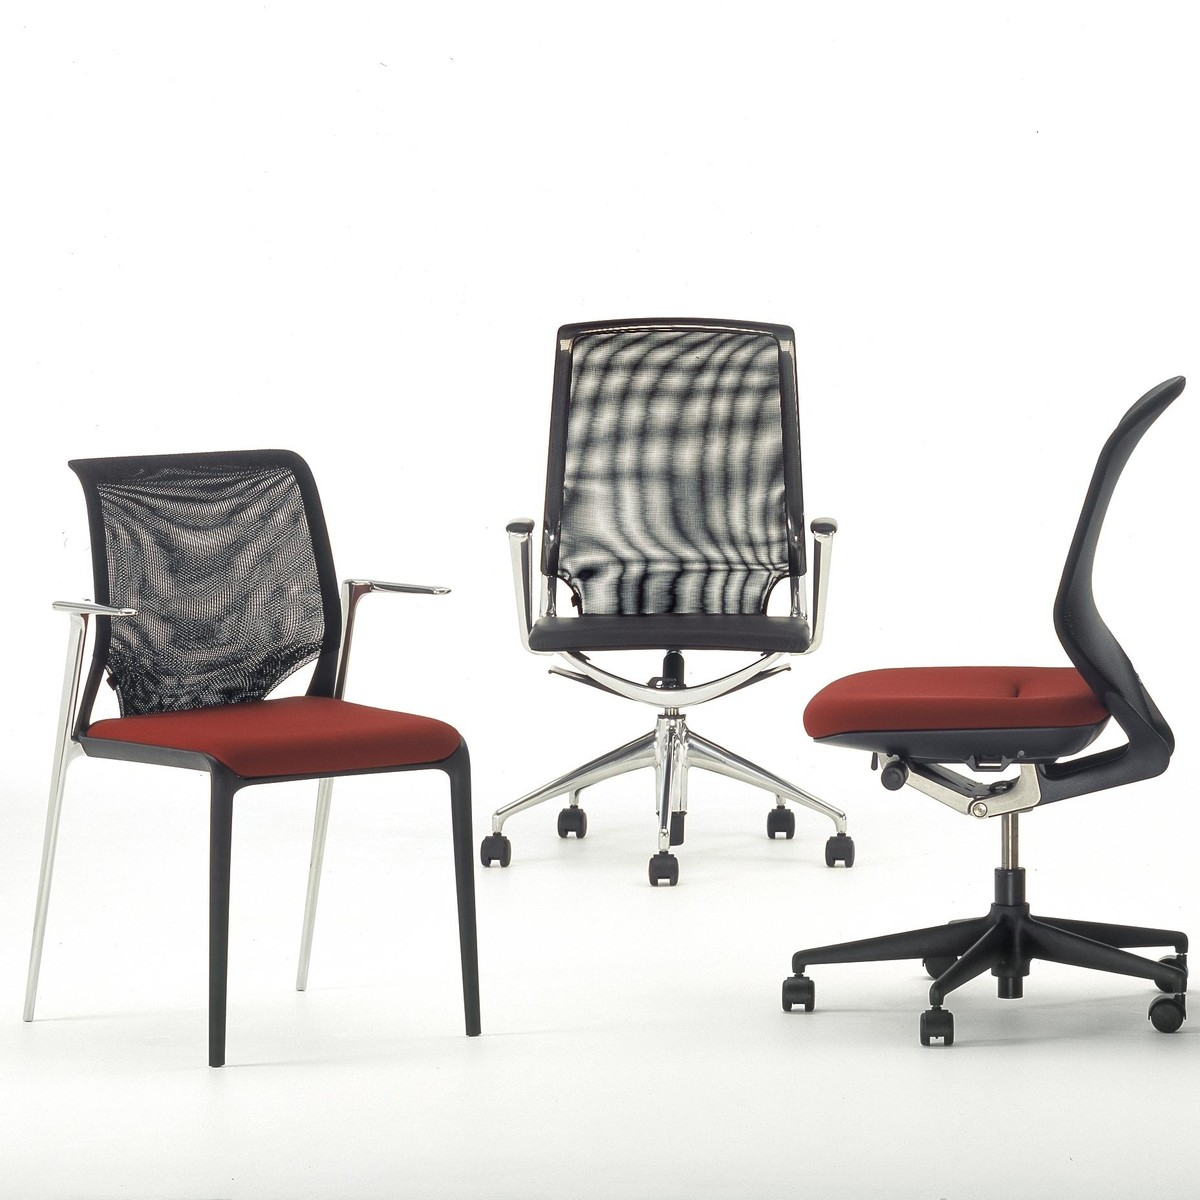 Vitra meda chair chaise de bureau vitra for Chaise vitra bureau